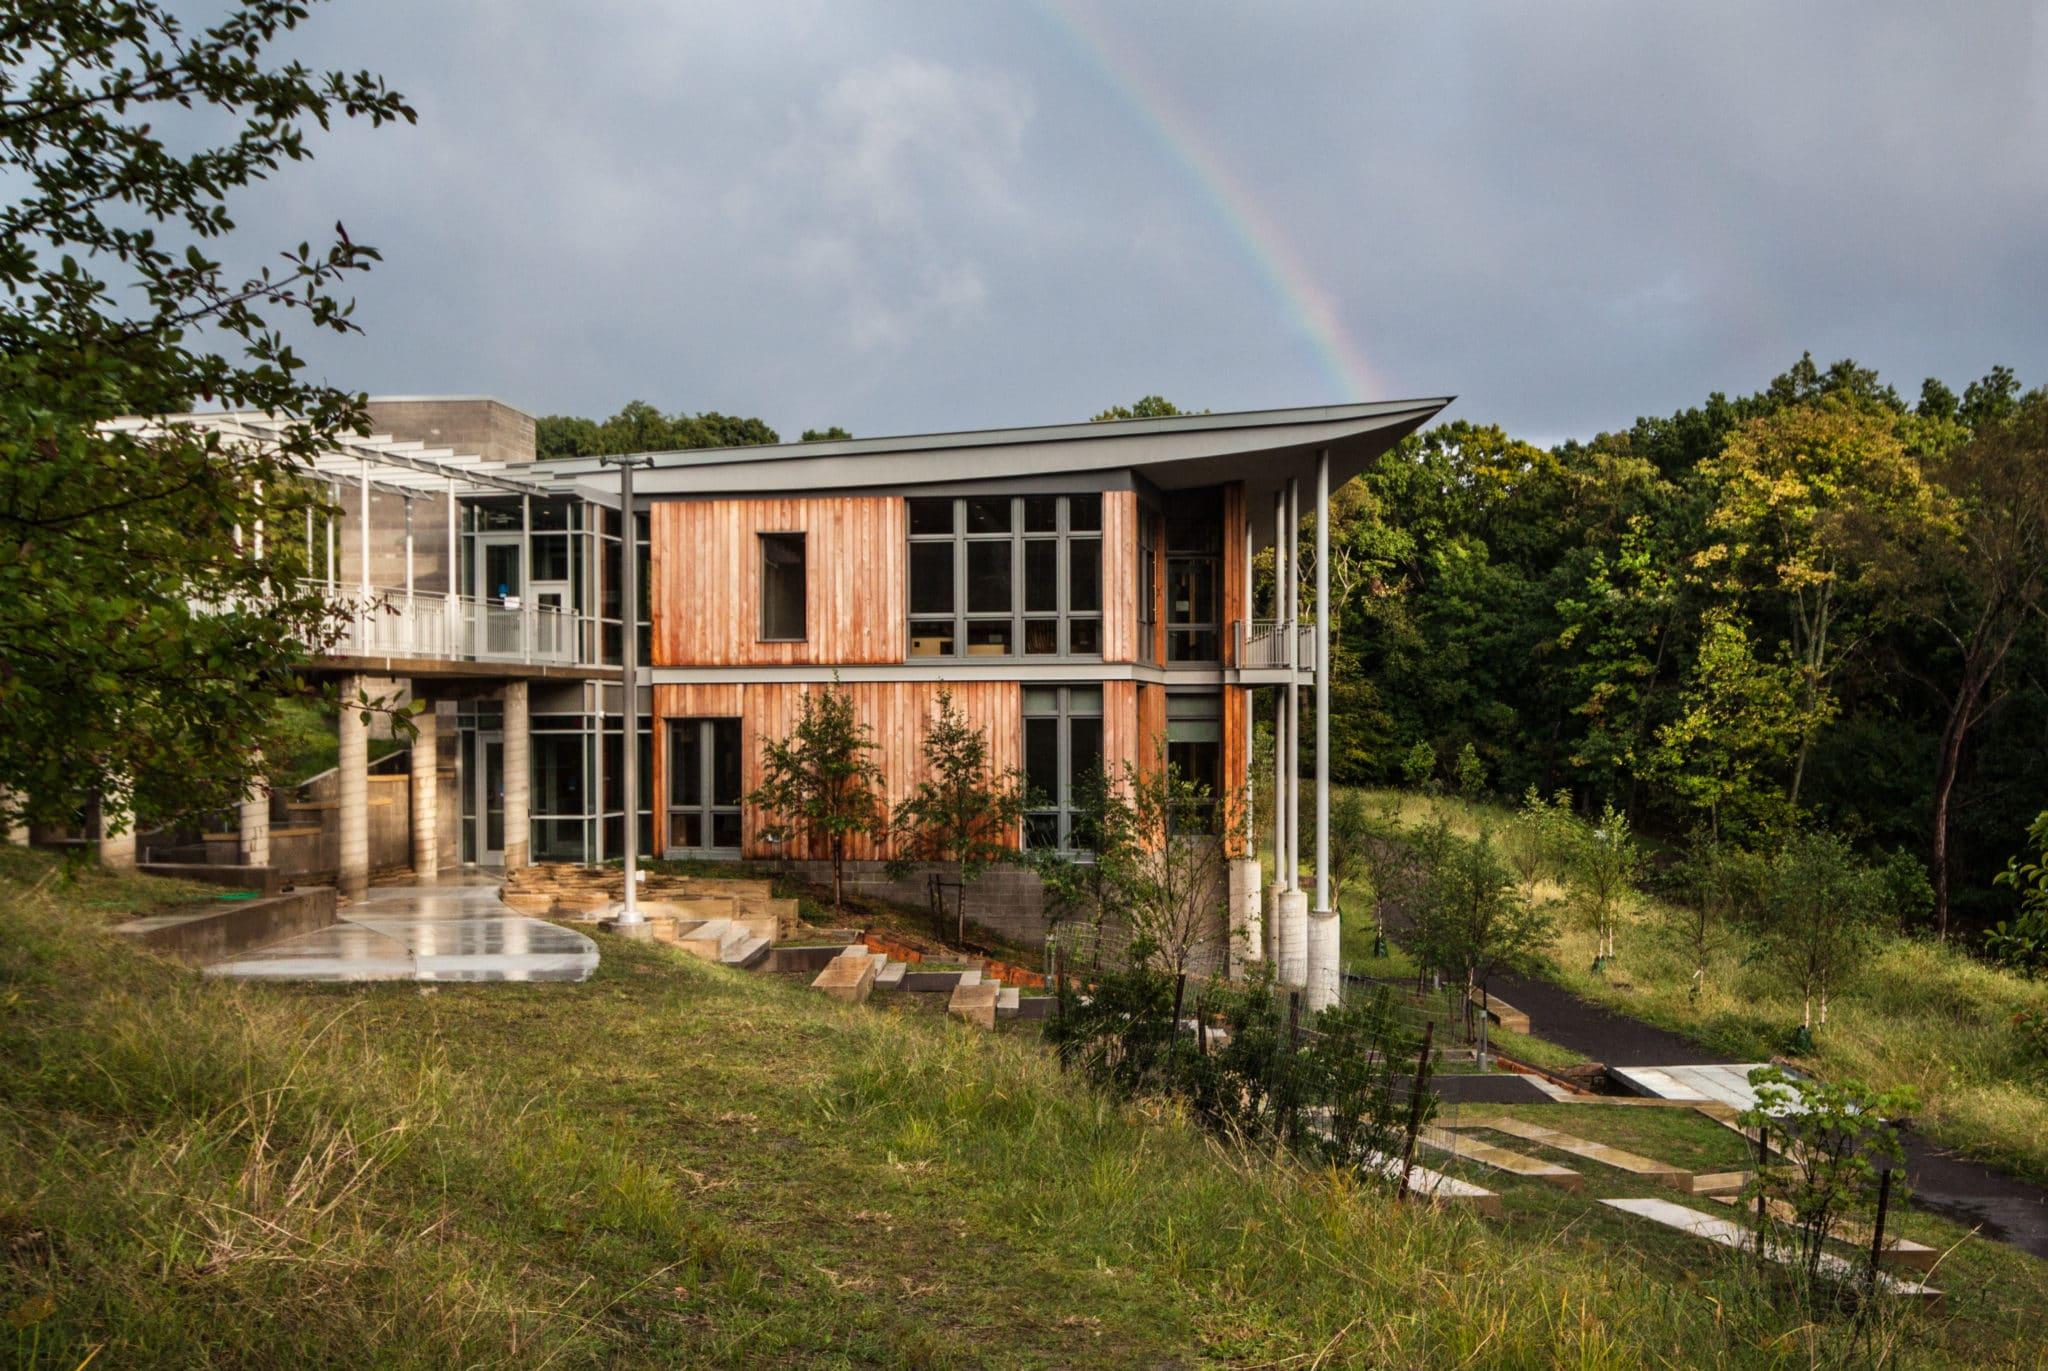 A rainbow over the Frick Environmental Center